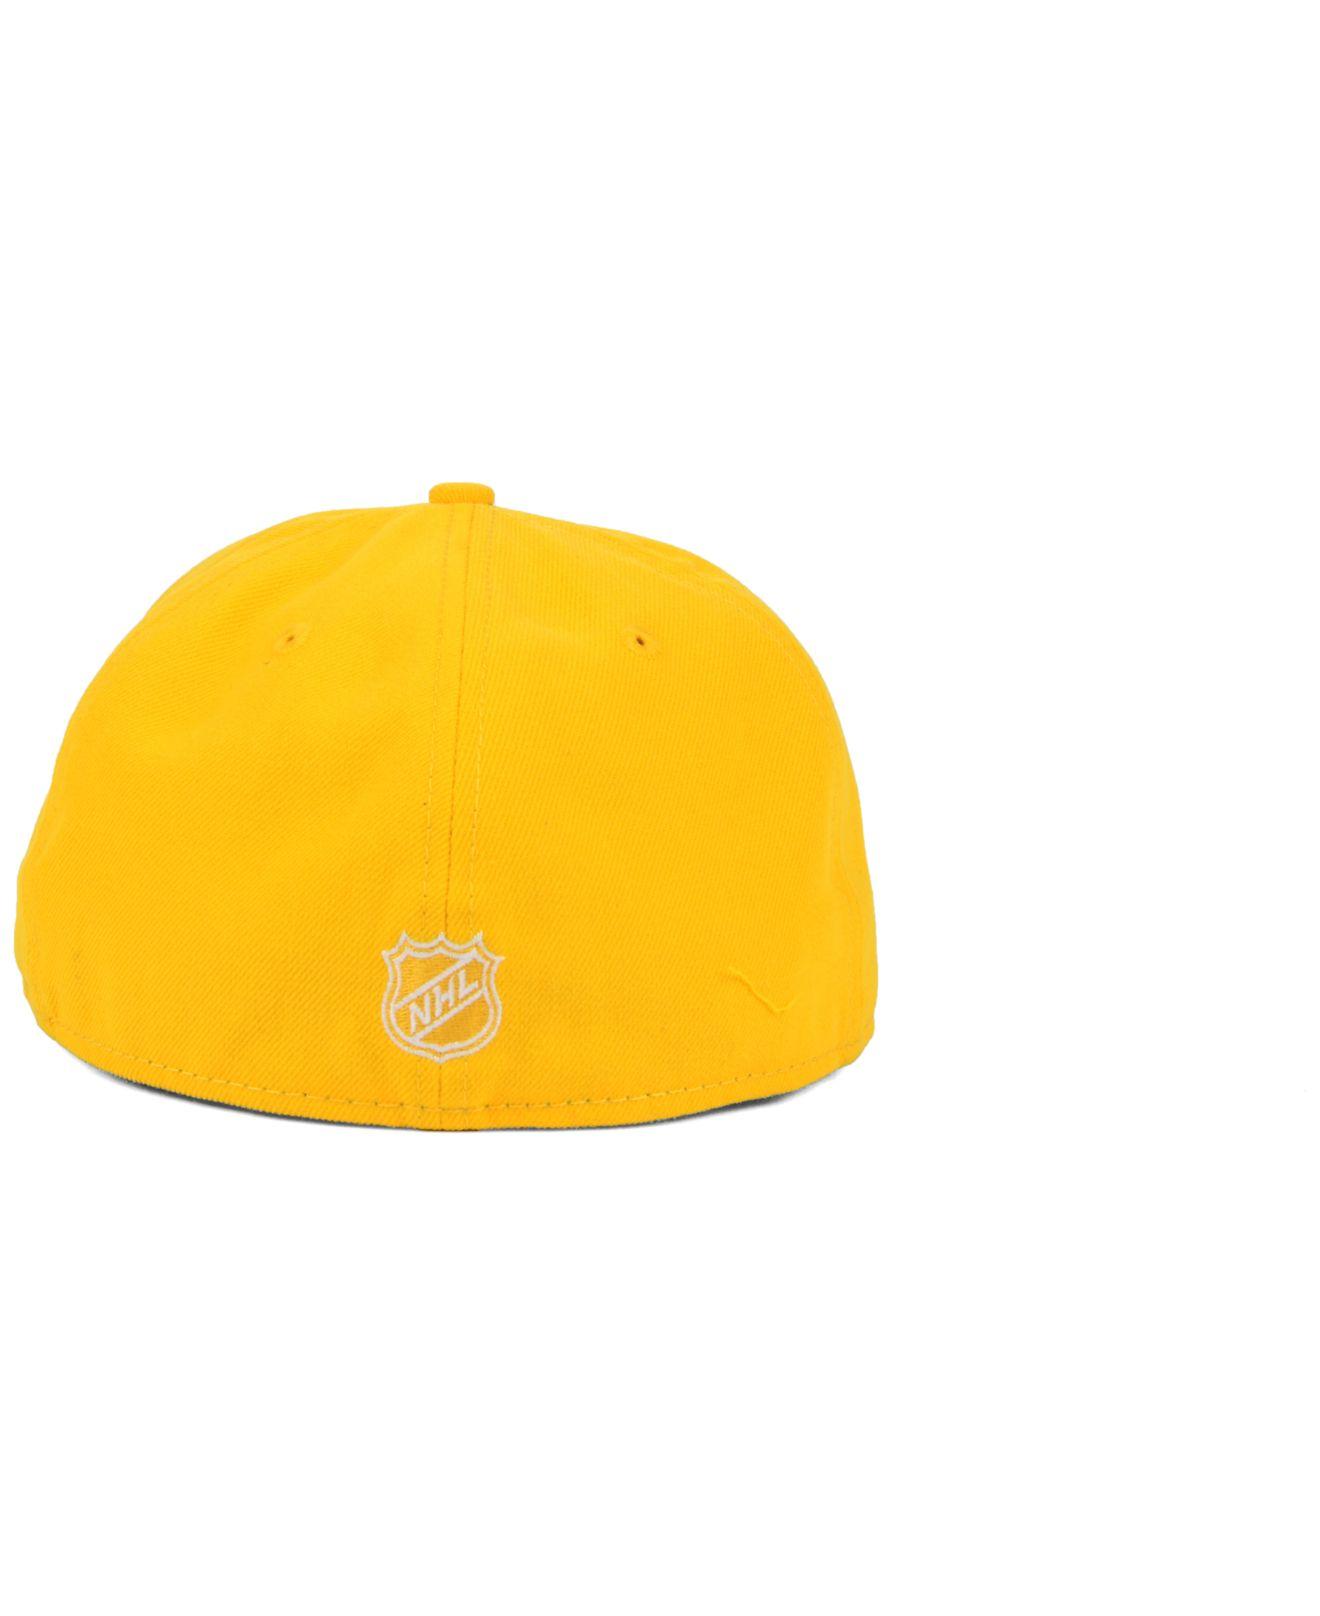 Lyst - Ktz San Jose Sharks C-dub 59fifty Cap in Yellow for Men 1a5355a12e27